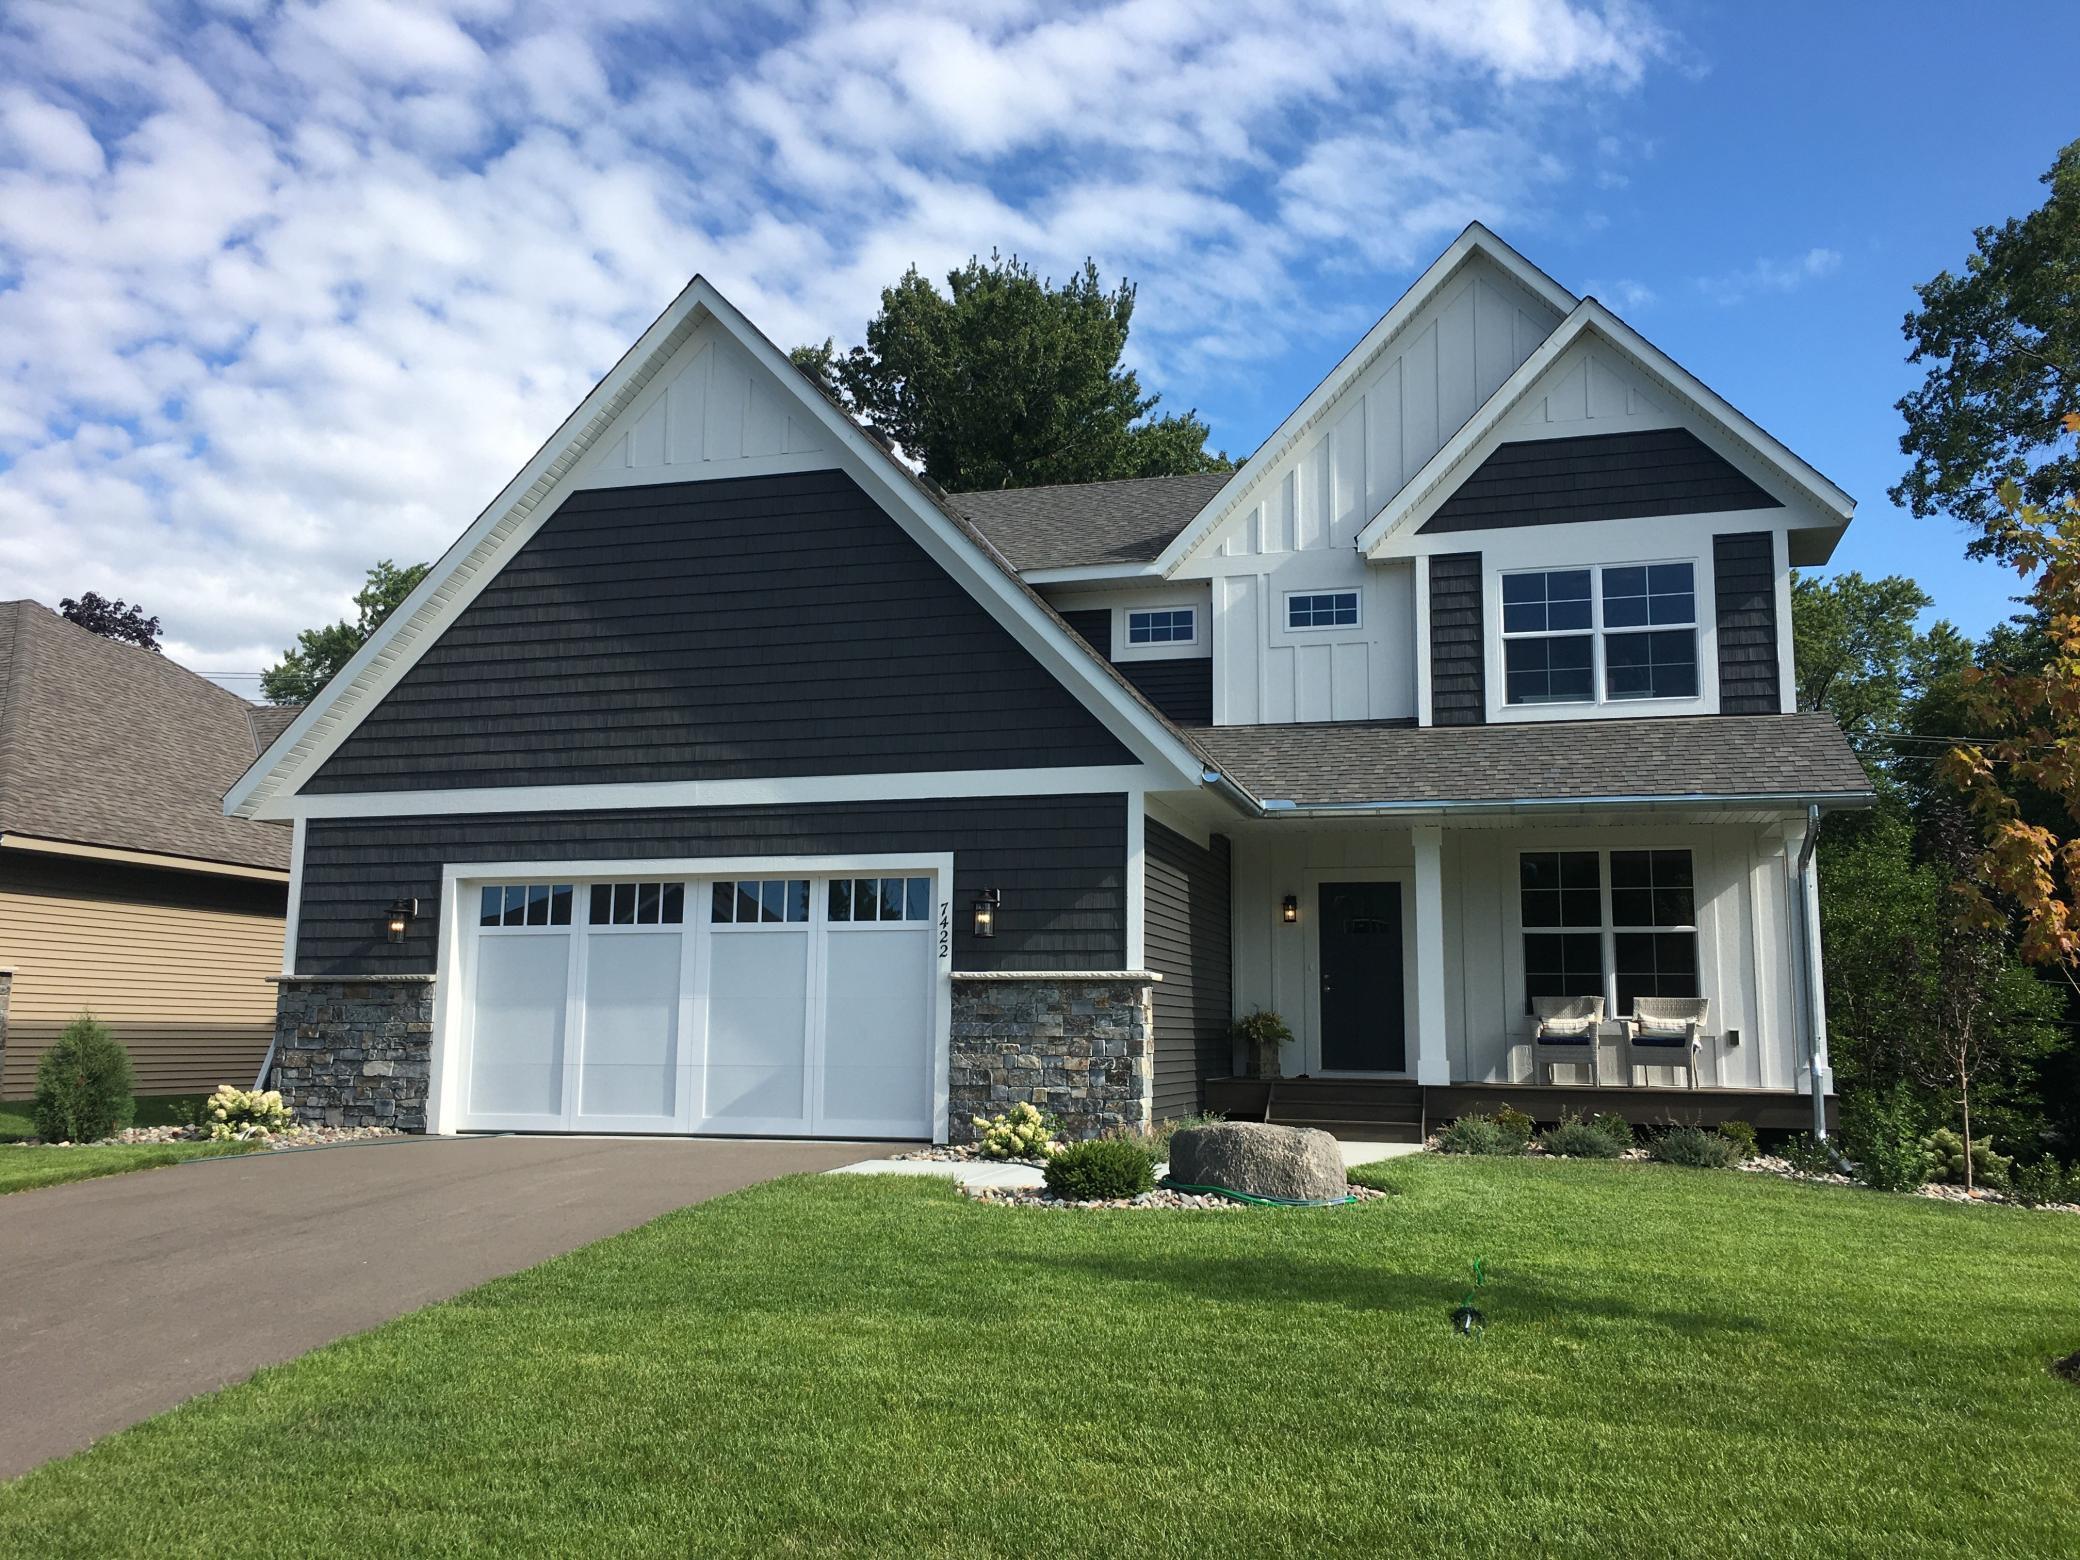 7422 N 51st Avenue N Property Photo - New Hope, MN real estate listing